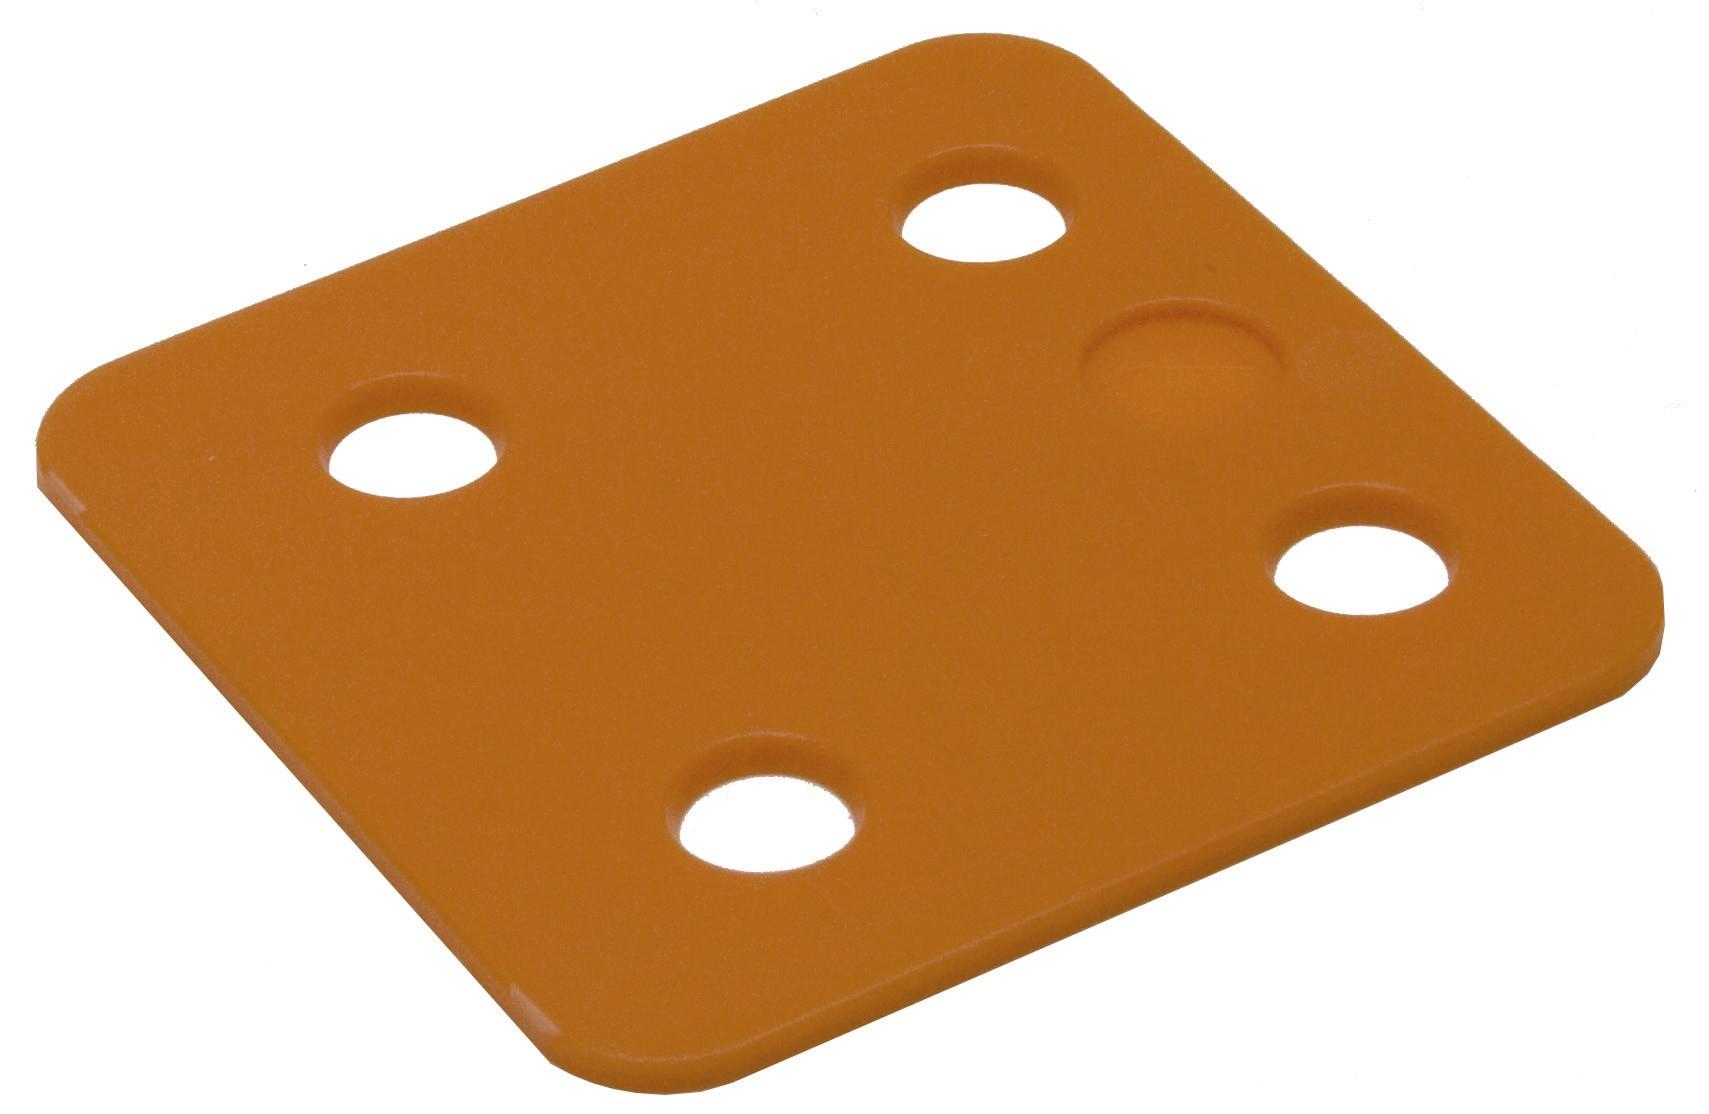 Plaques de pression orange 2 70x70 KS